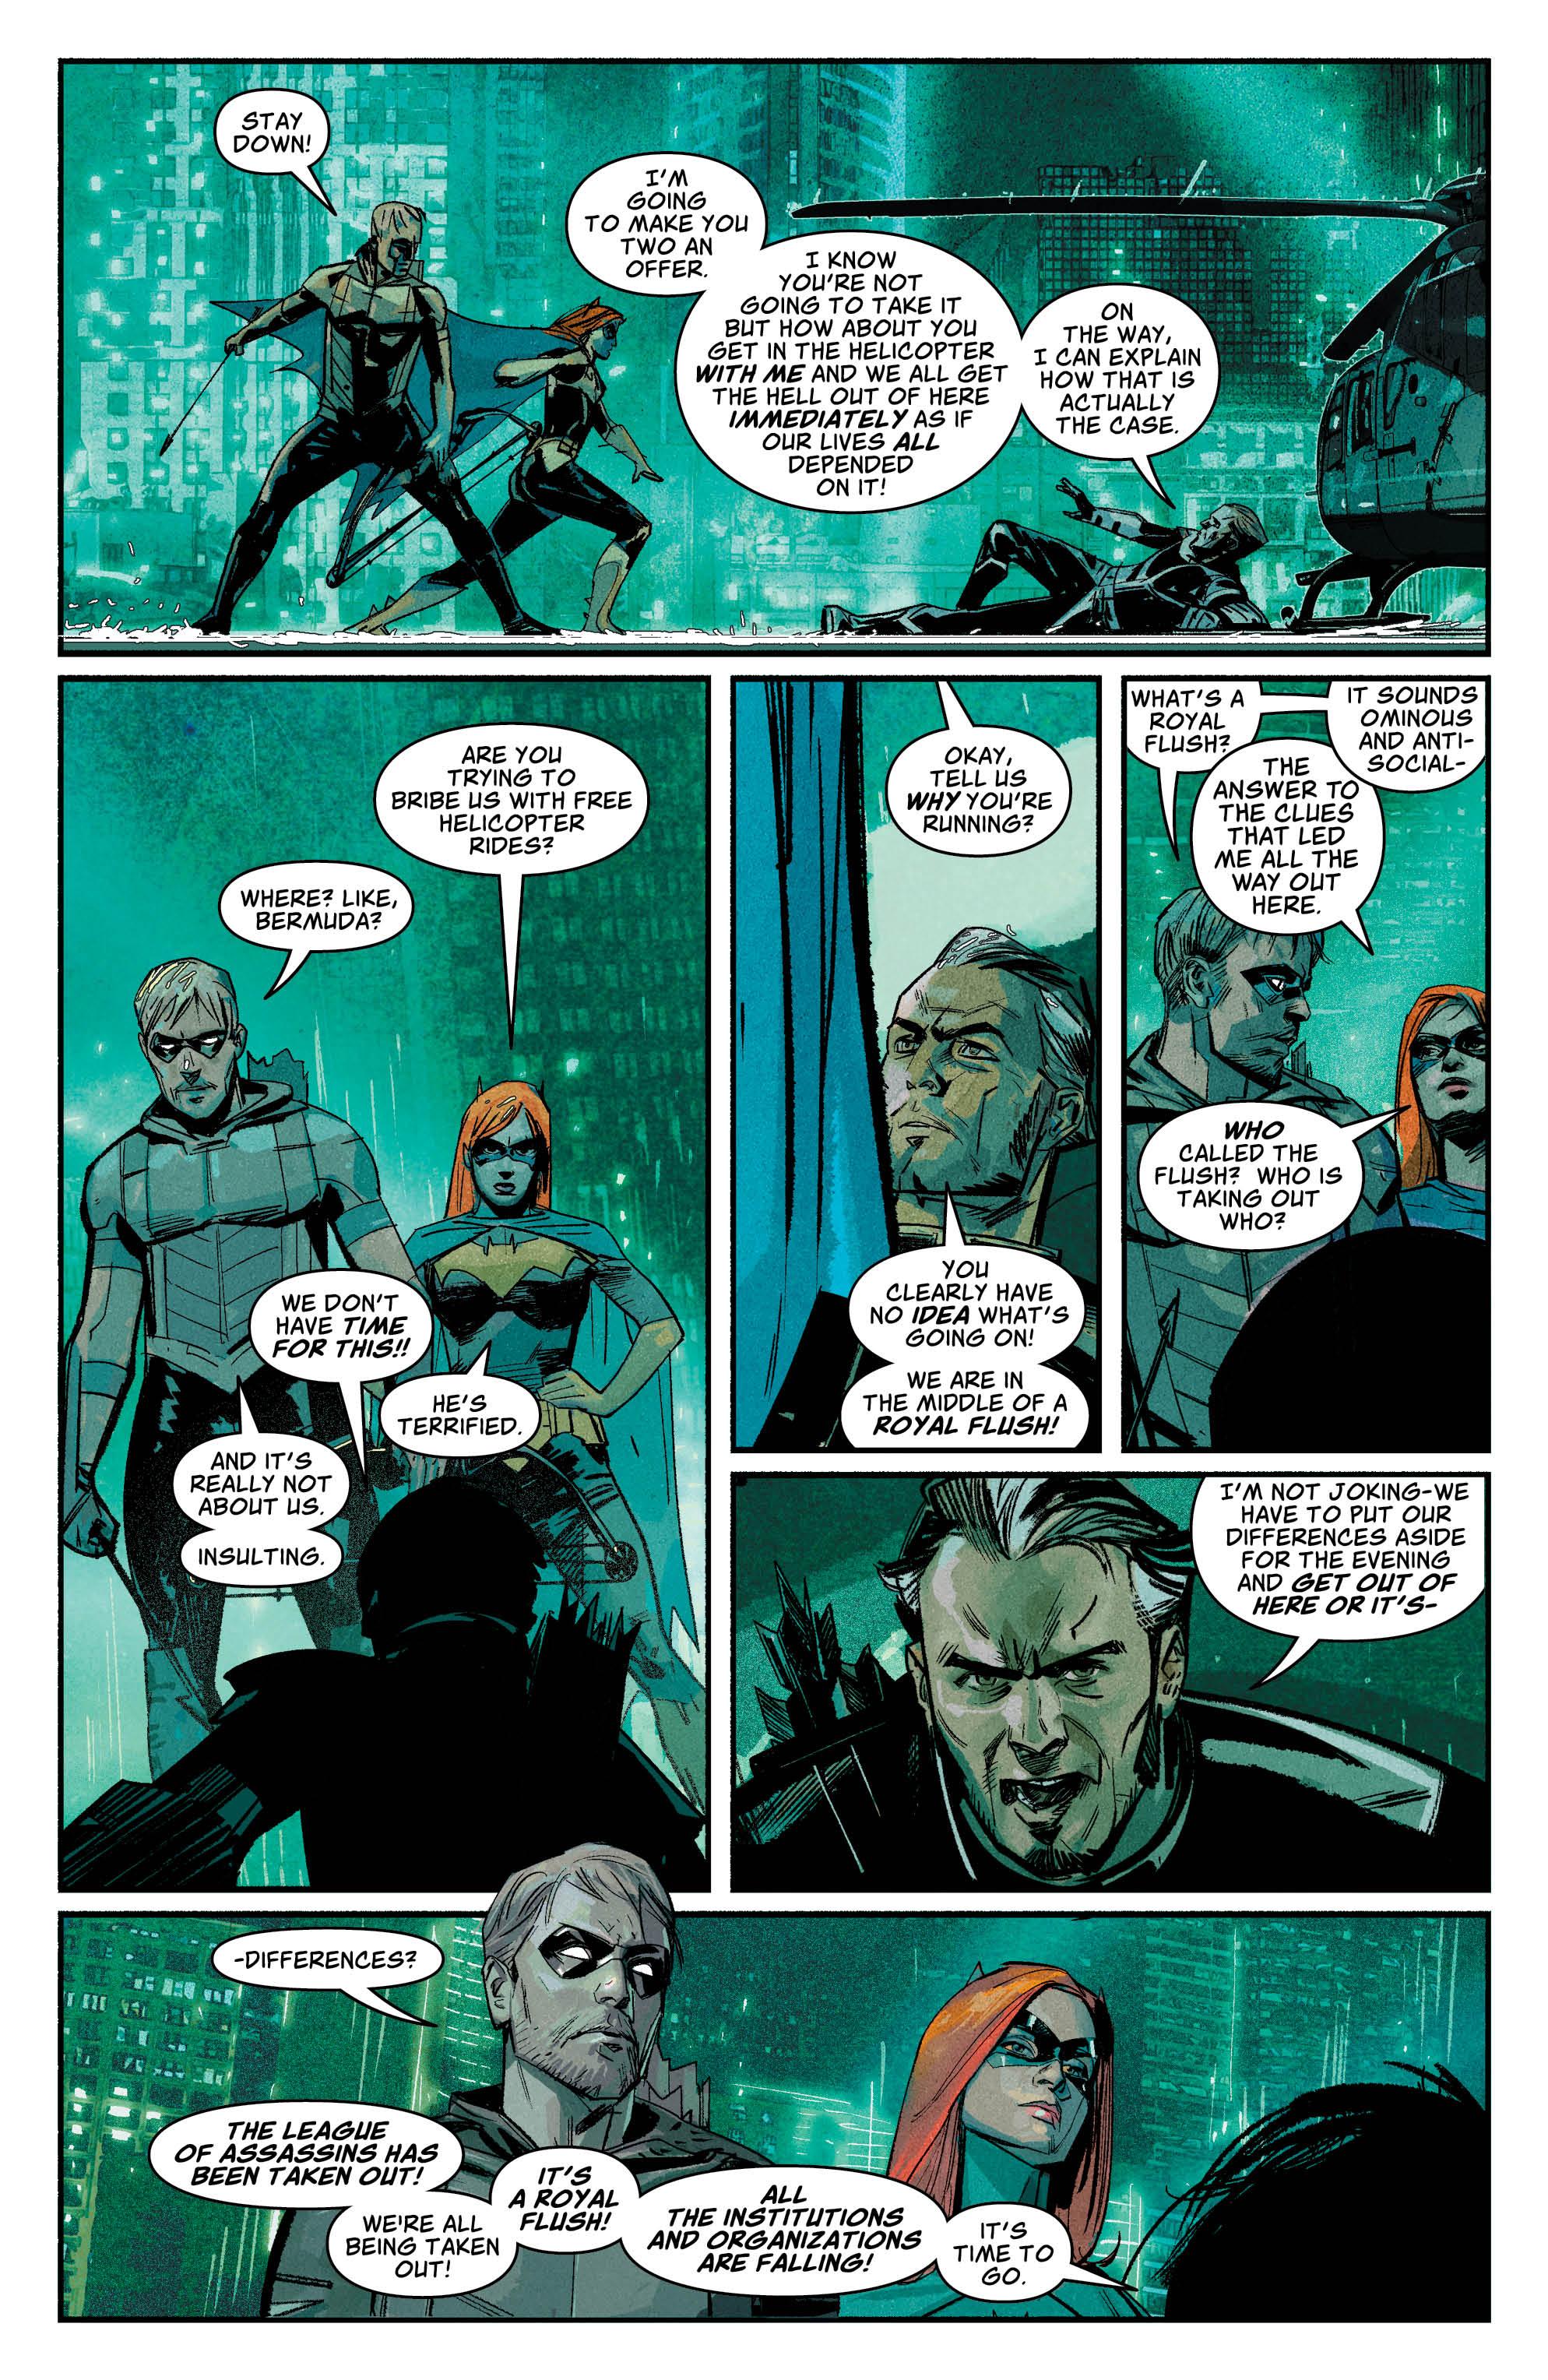 DCYOTVS_Story_02_Leviathan_3.jpg